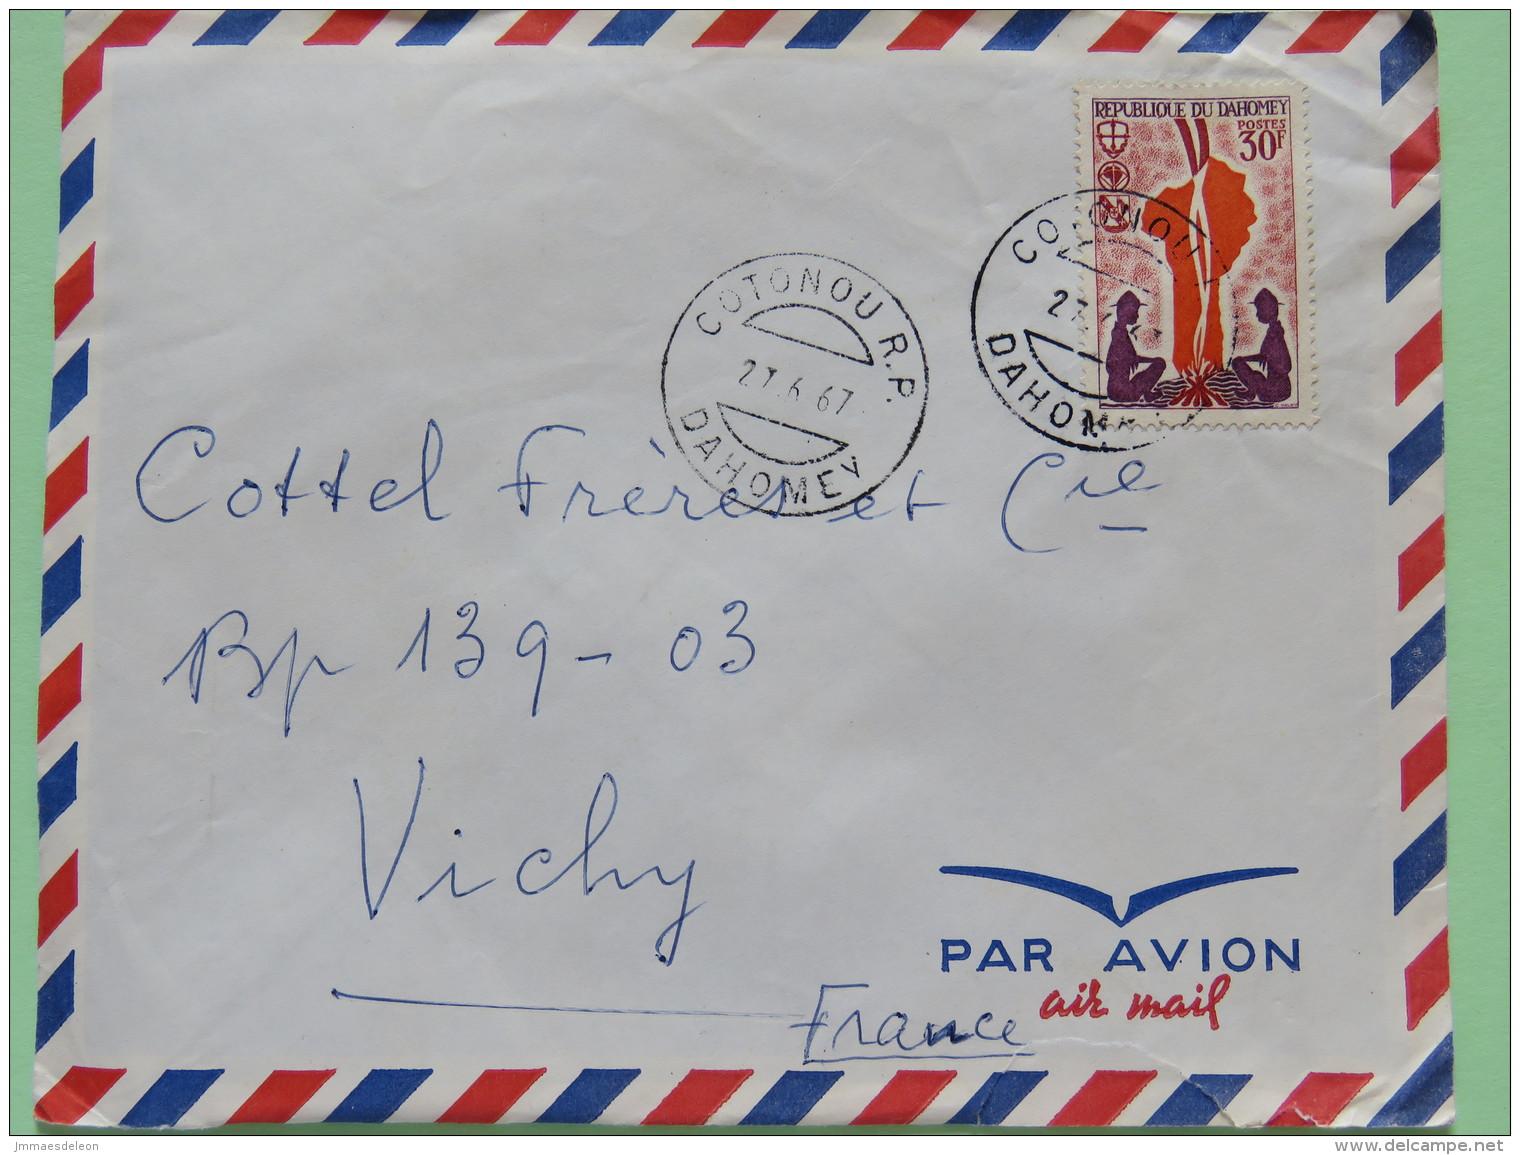 Dahomey (Benin) 1967 Cover Cotonou To Vichy France - Scouts Campfire Map - Benin - Dahomey (1960-...)